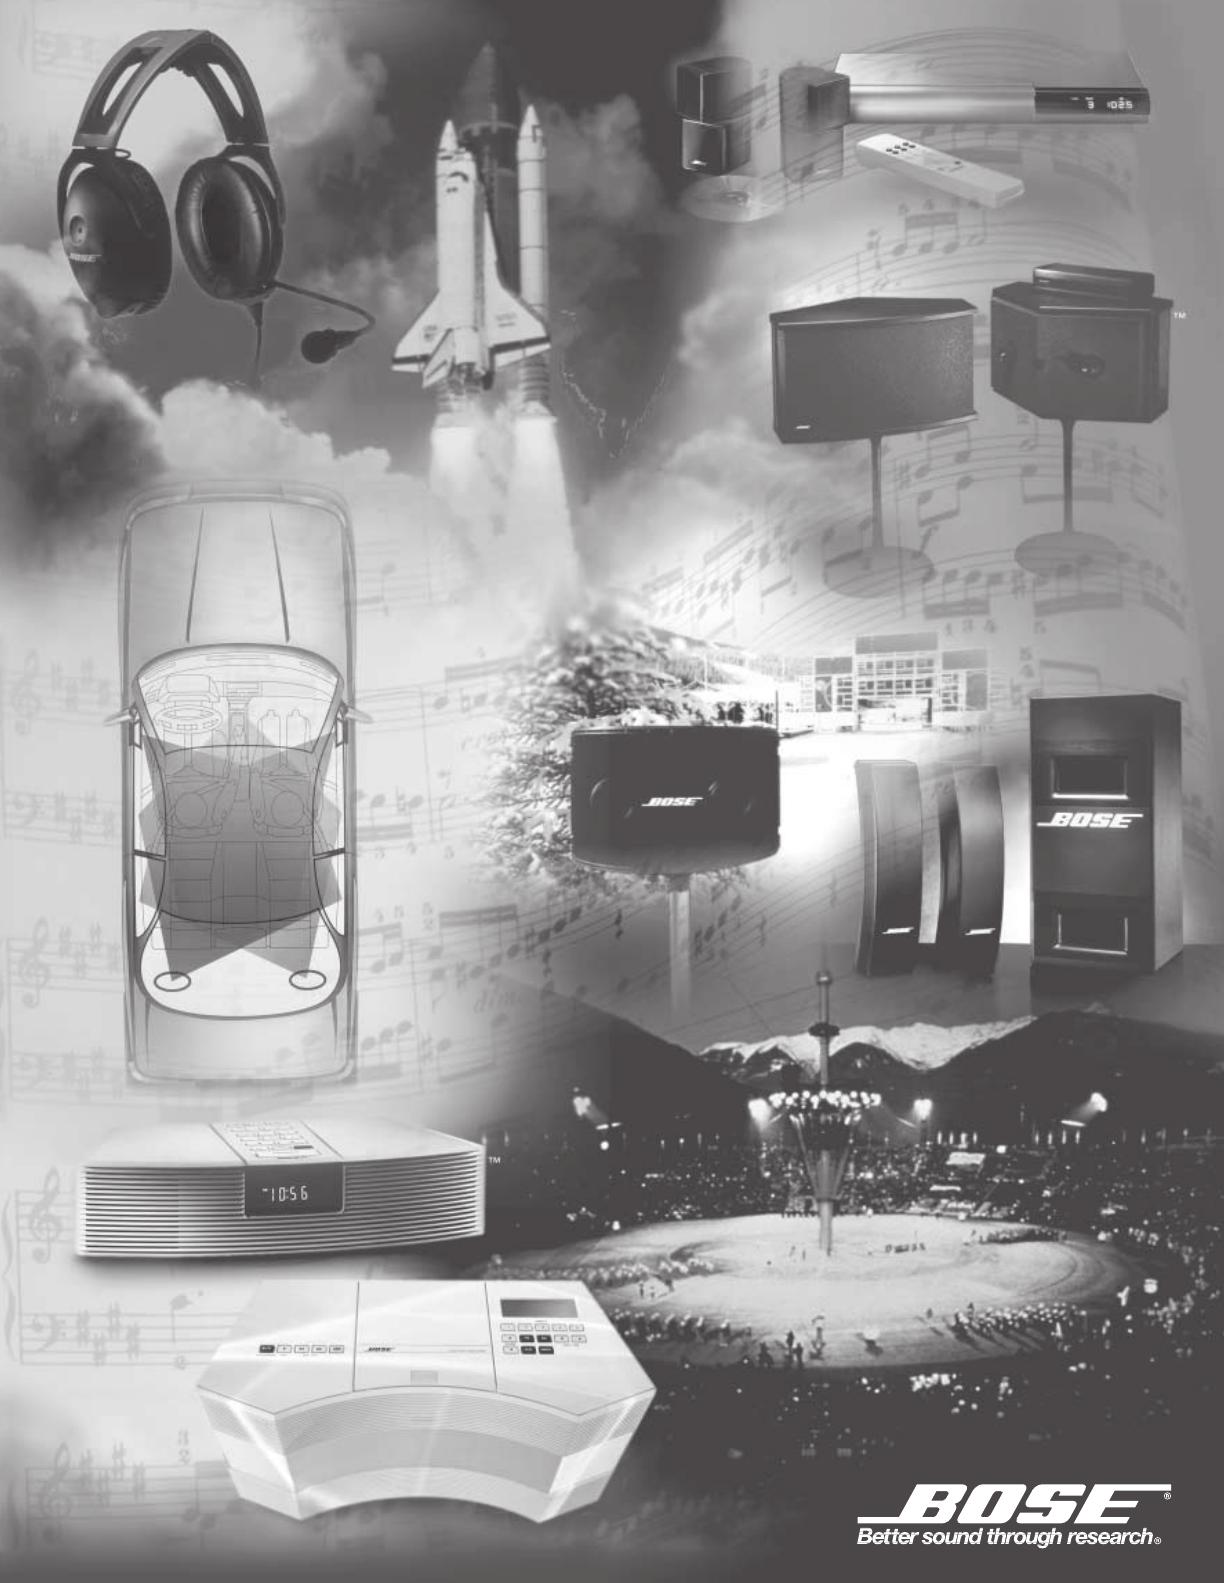 Handleiding bose wave radio cd pagina 28 van 30 english 2000 bose corporation the mountain framingham ma 01701 9168 usa publicscrutiny Image collections